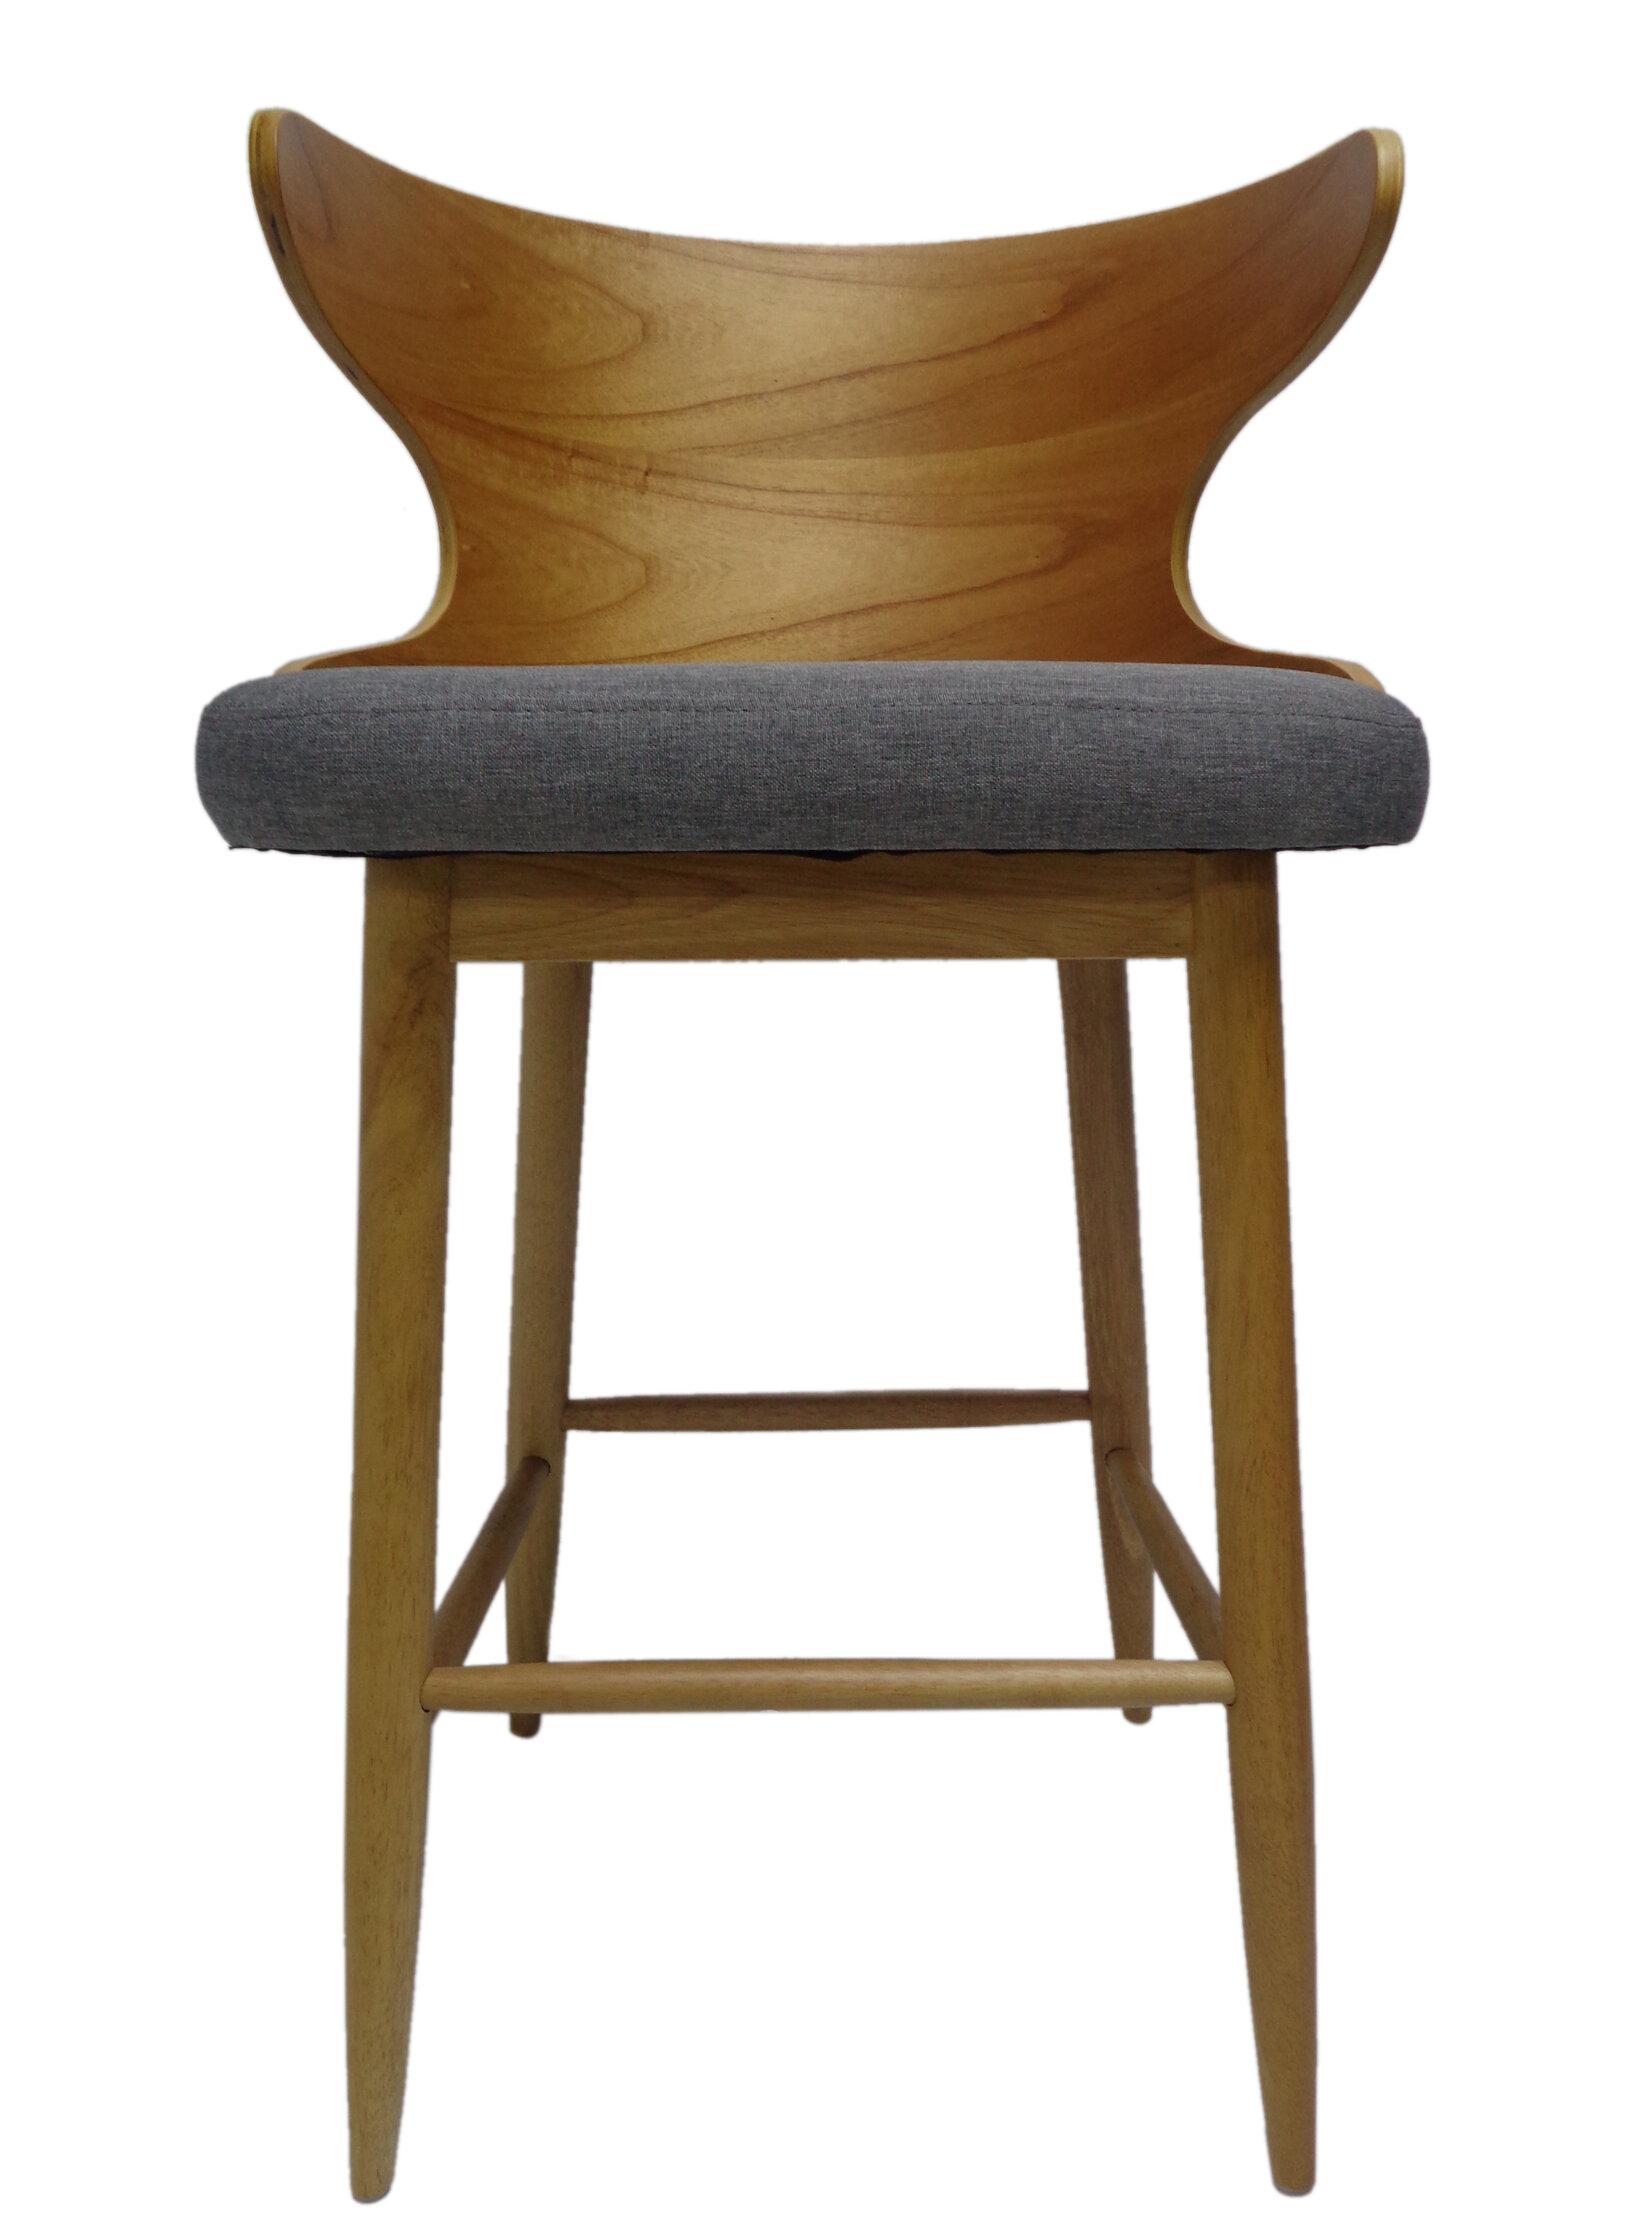 Excellent Overturf Mid Century Modern 30 Bar Stool Squirreltailoven Fun Painted Chair Ideas Images Squirreltailovenorg